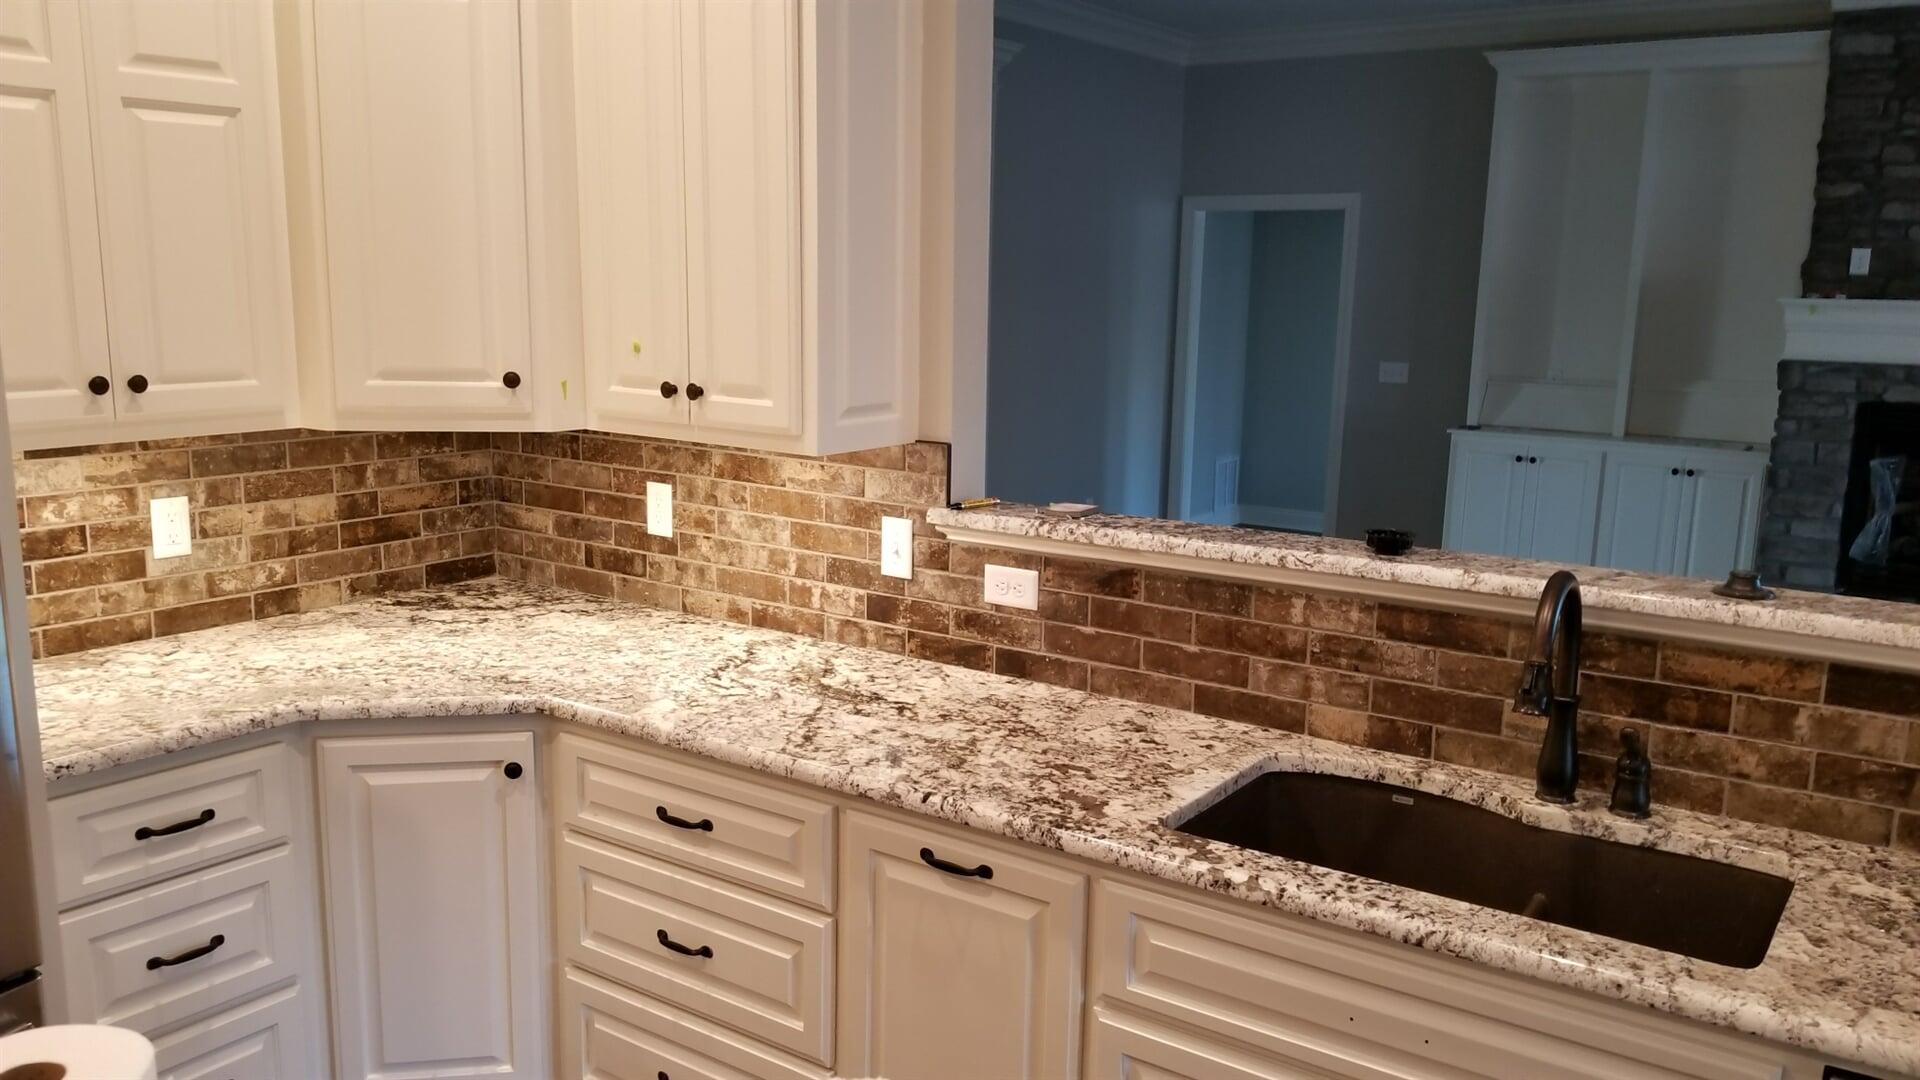 kitchen backsplash from Roop's Carpet in Bald Knob, AR